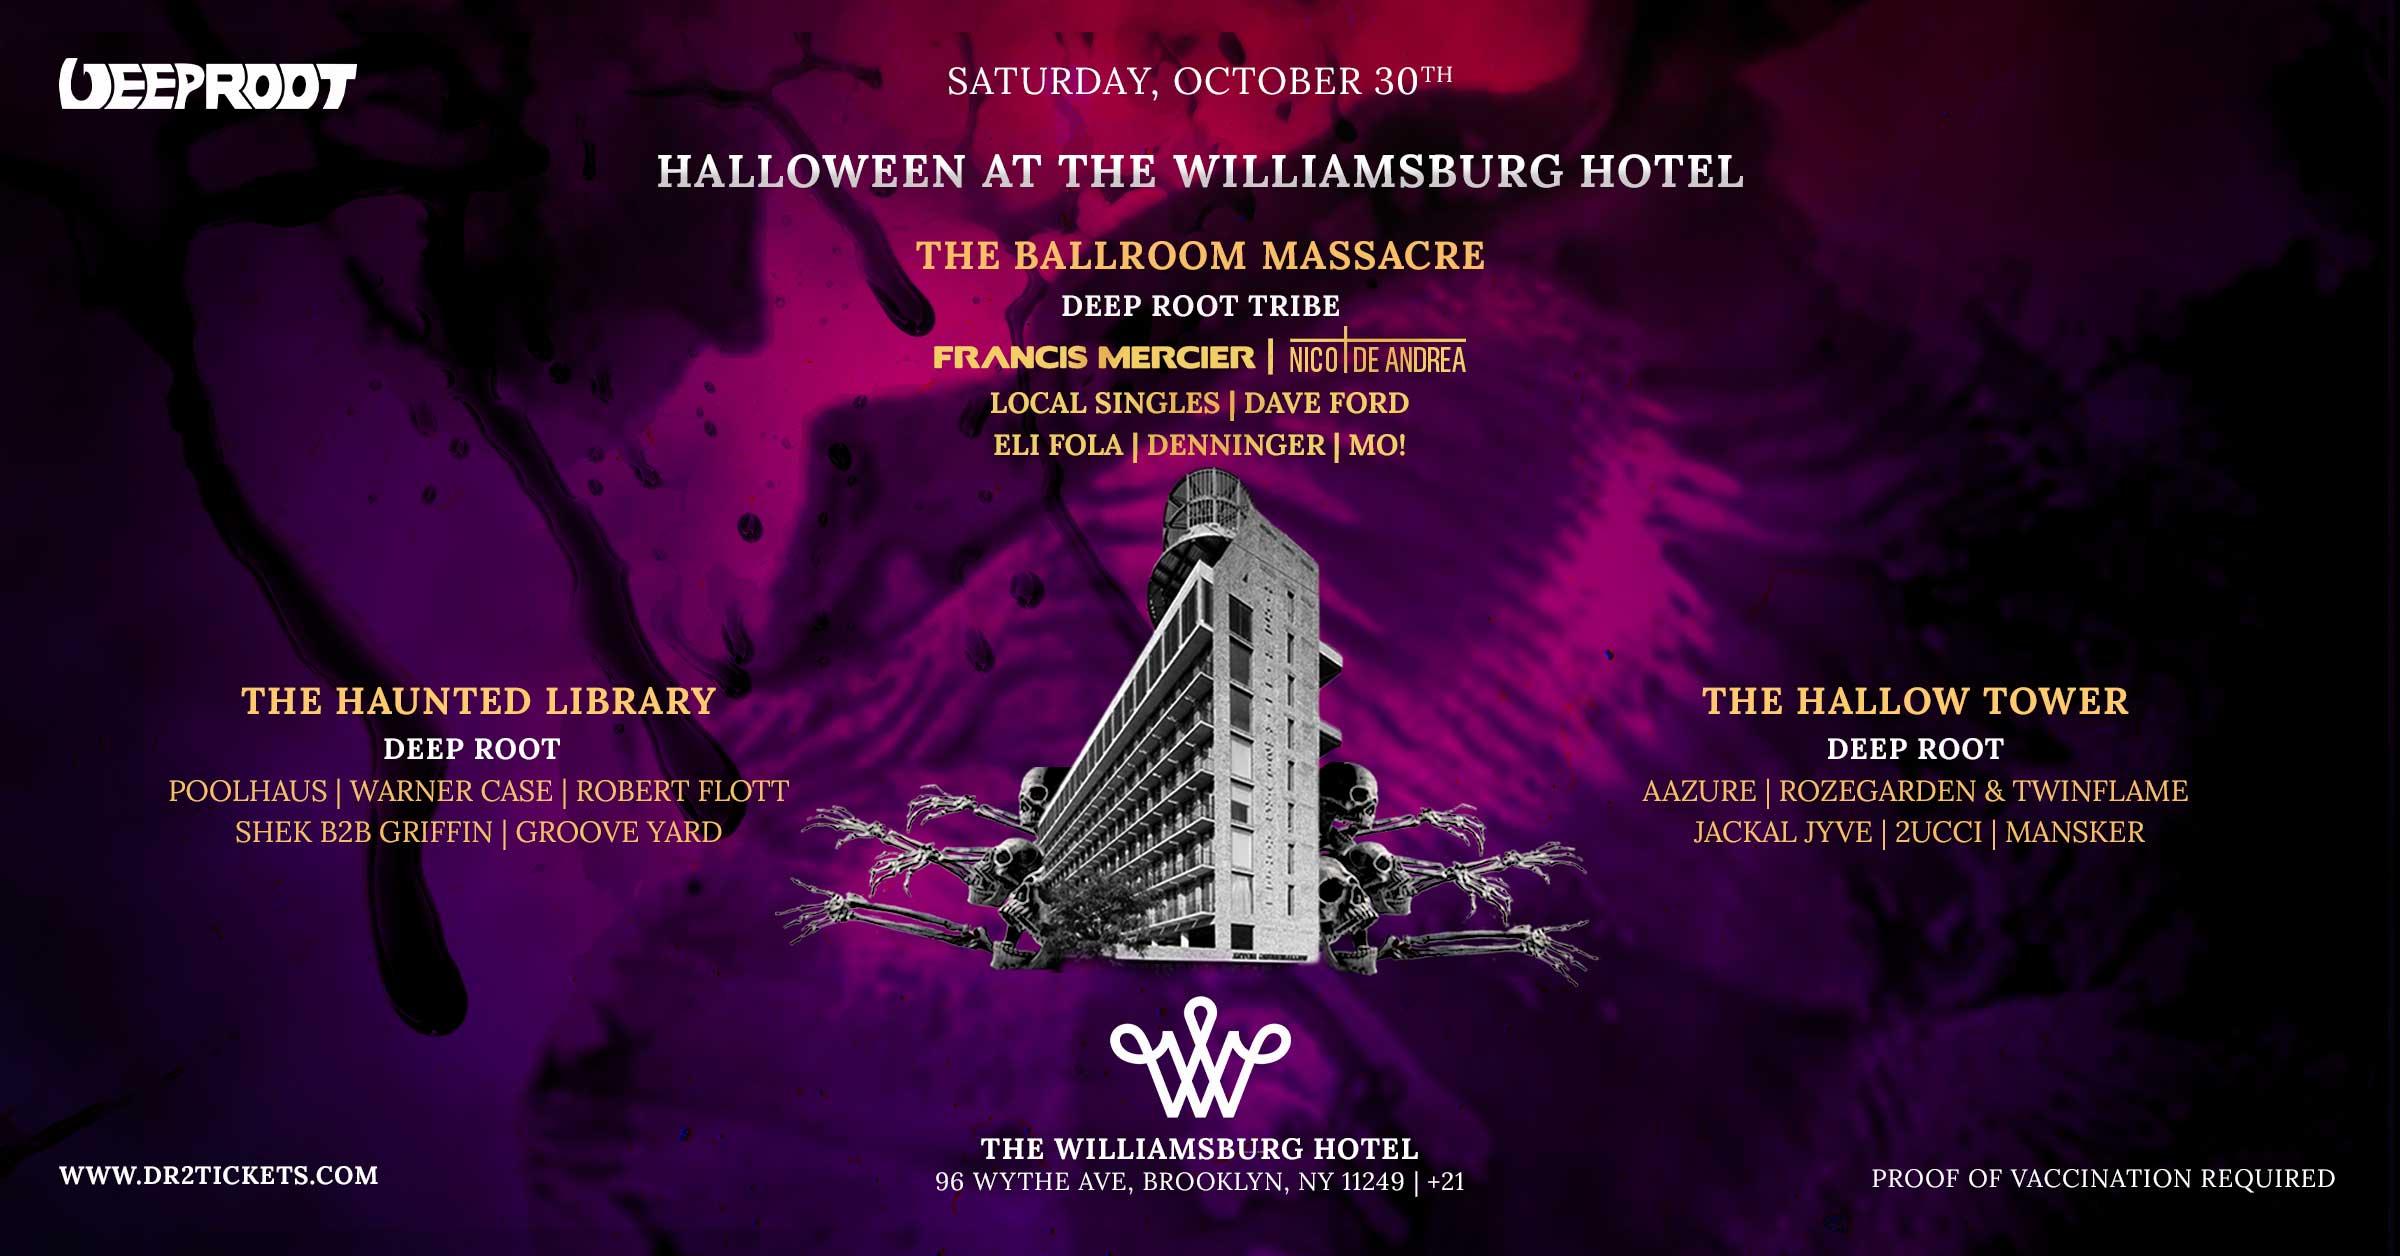 Halloween At The Williamsburg Hotel Chronicle II ft. Francis Mercier [10/30]